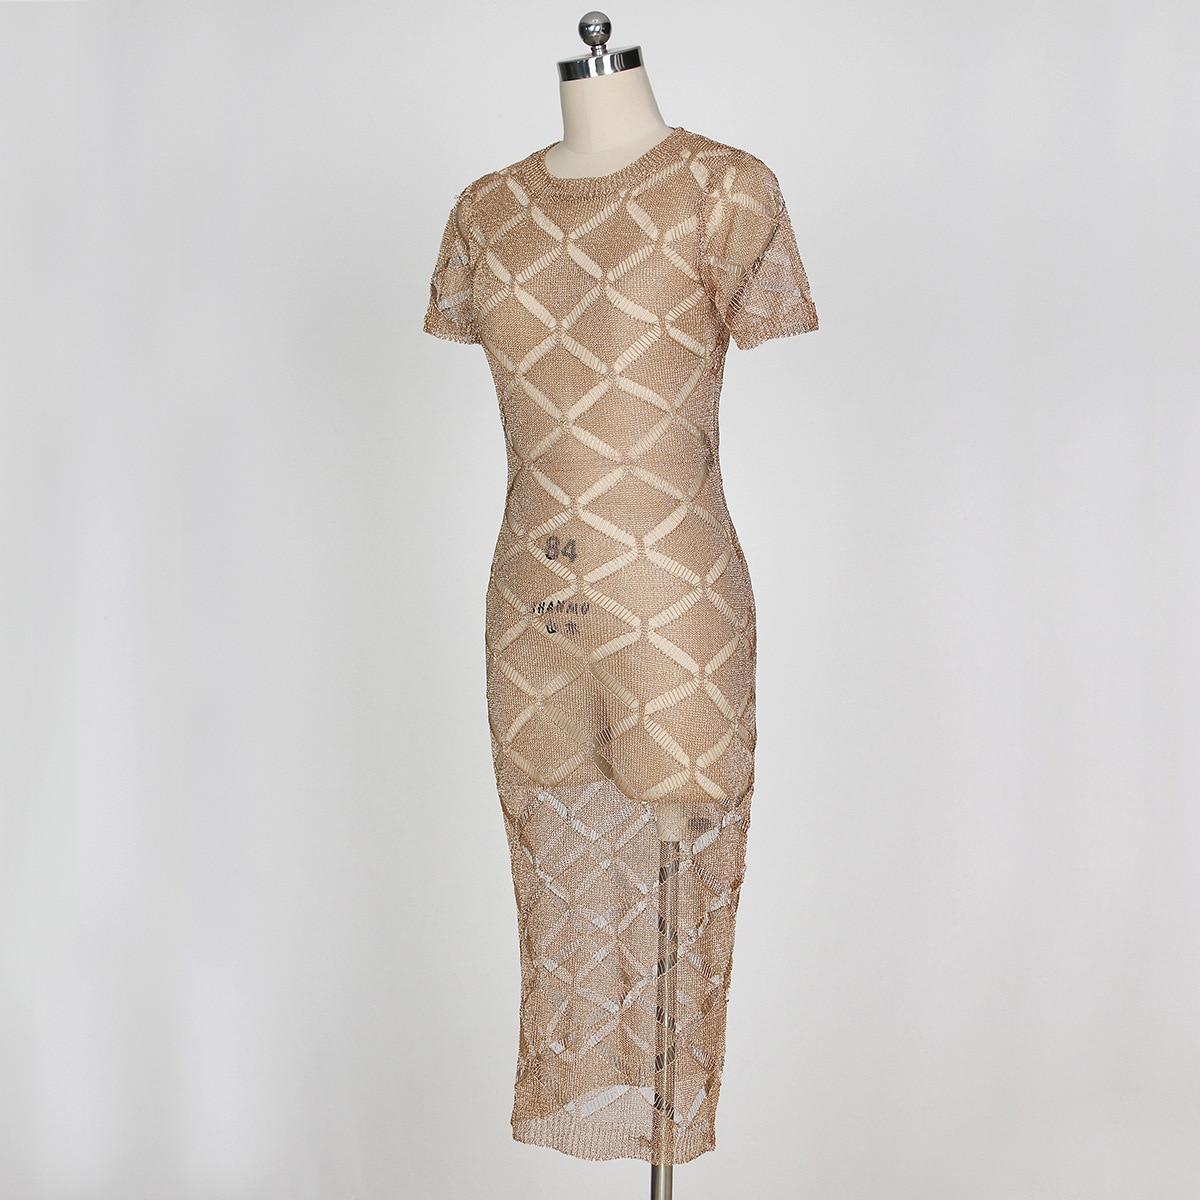 HTB14S4HSpXXXXb0XFXXq6xXFXXXu - 2018 Latest Summer Sexy Dress Rose Gold Knitted Nightclub Party Dresses Women Short Sleeve Fashion Casual Dress